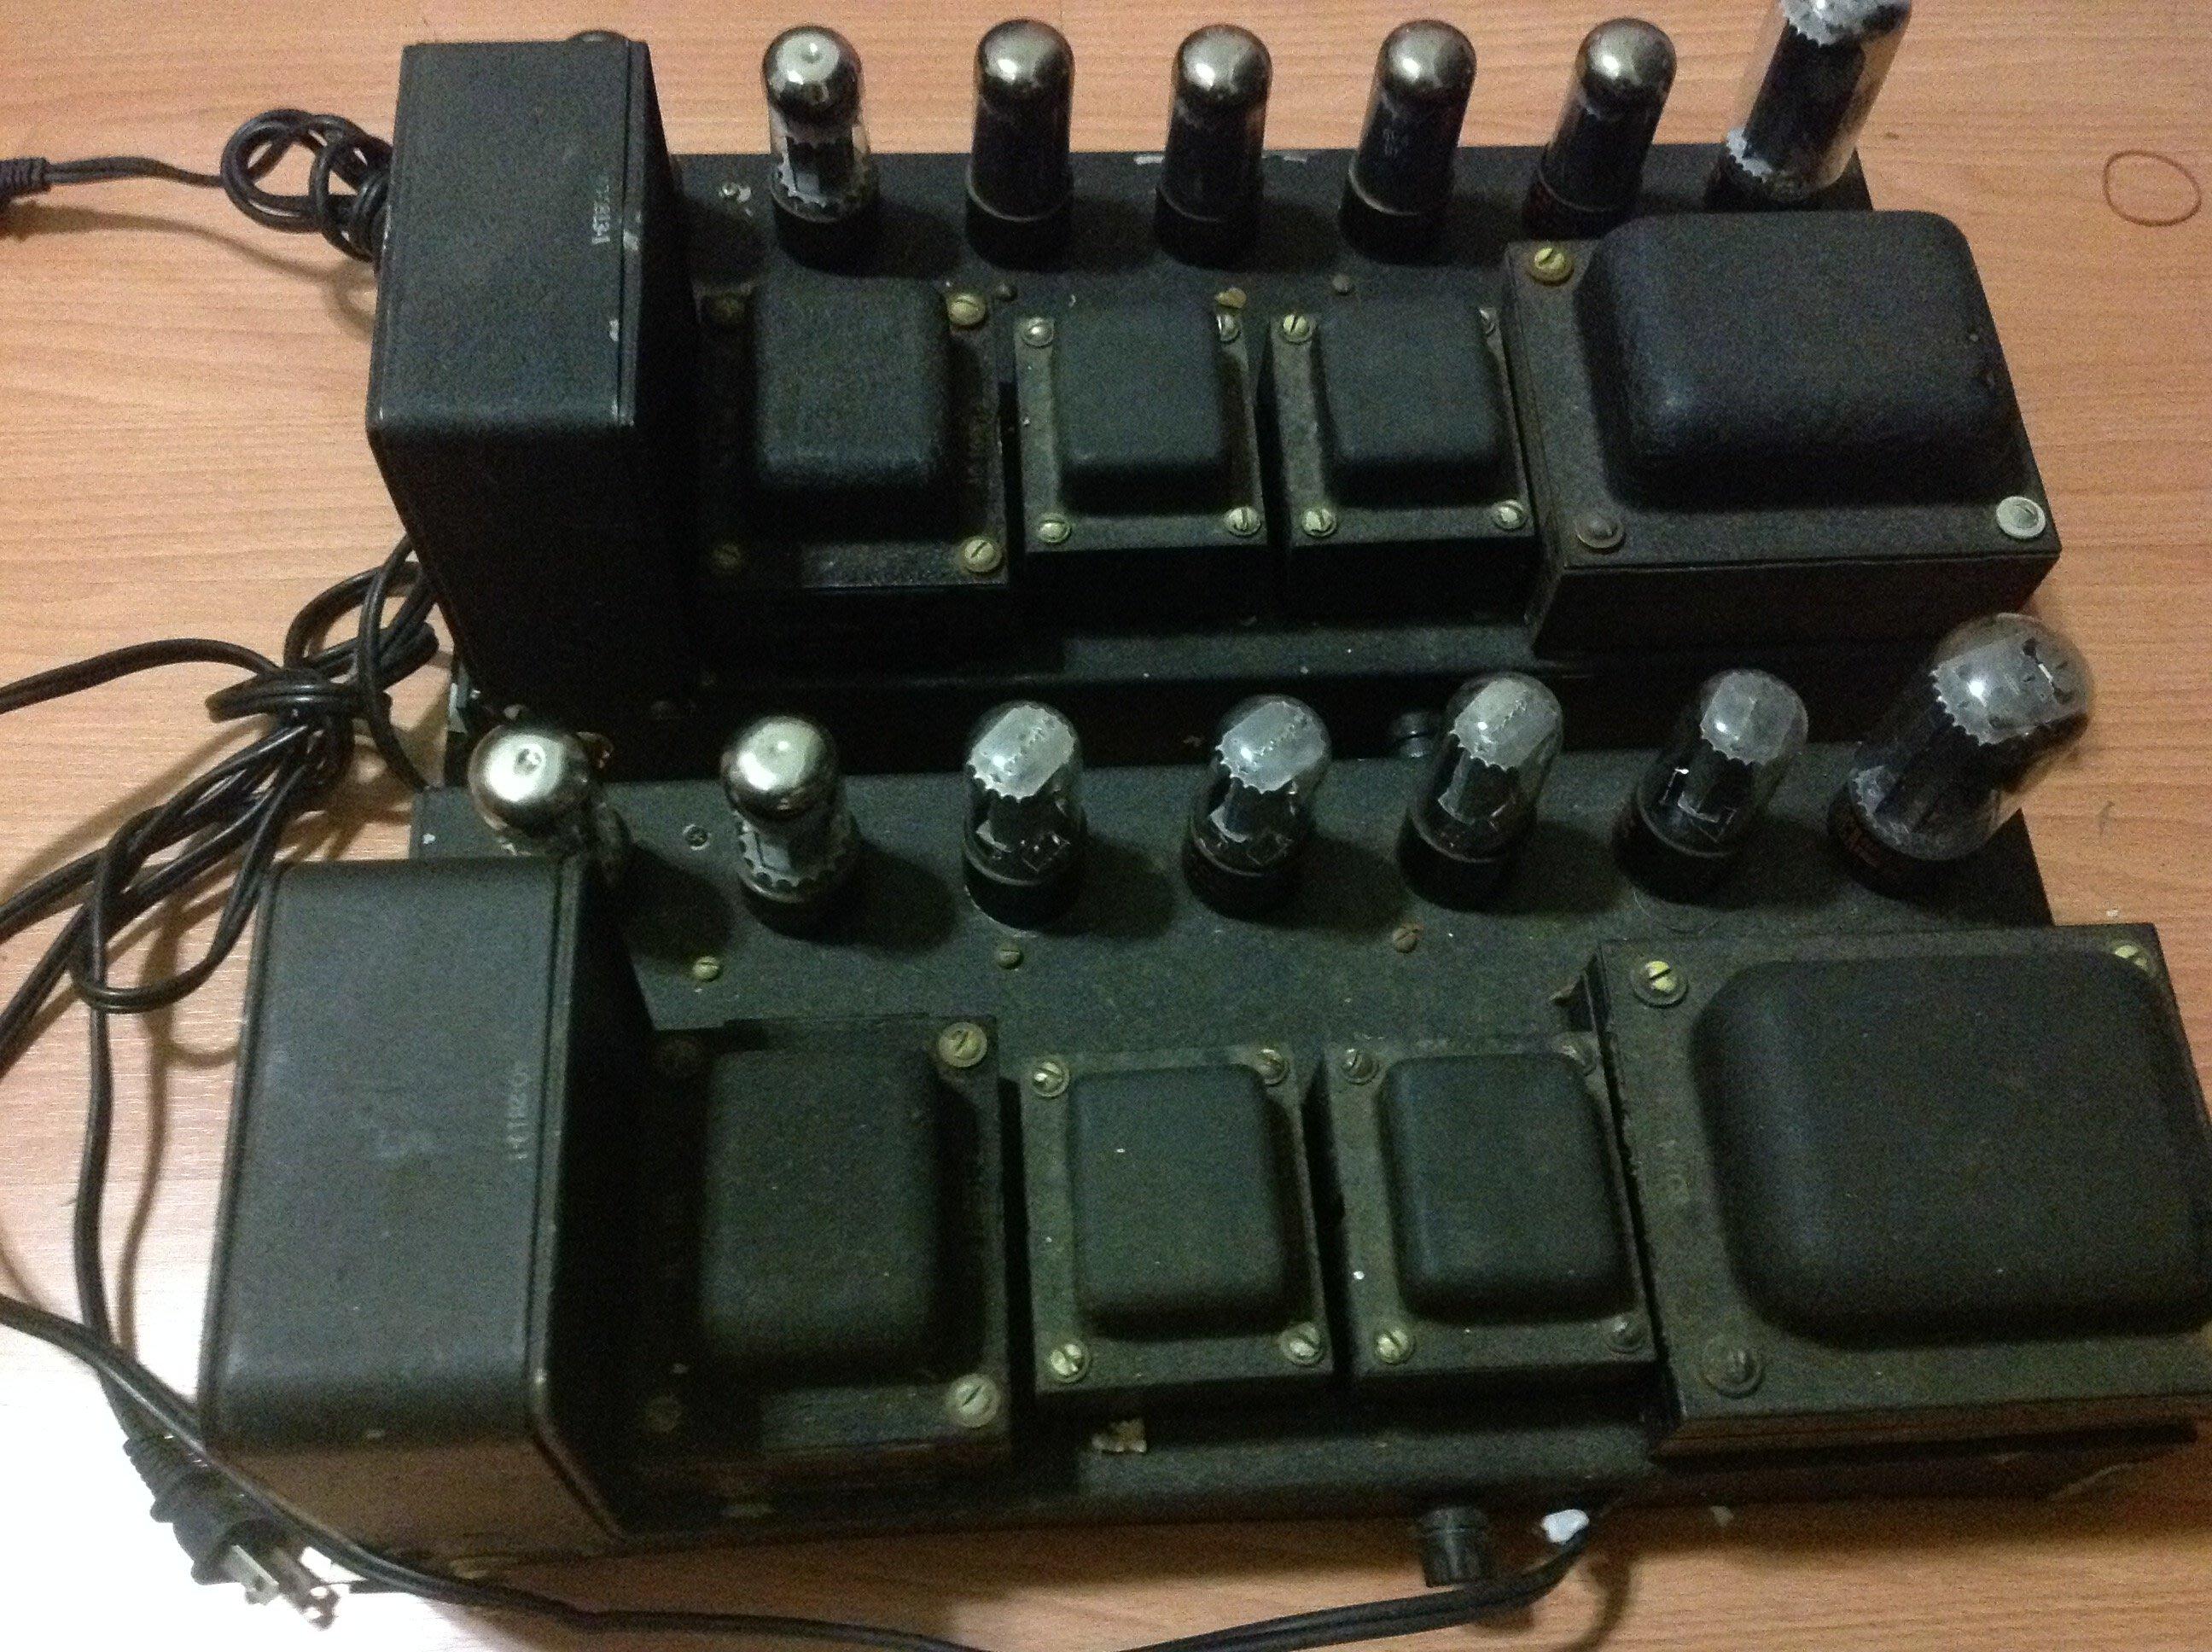 Jensen A12勵磁喇叭及擴大器(內建電源)一對 (4隻喇叭)